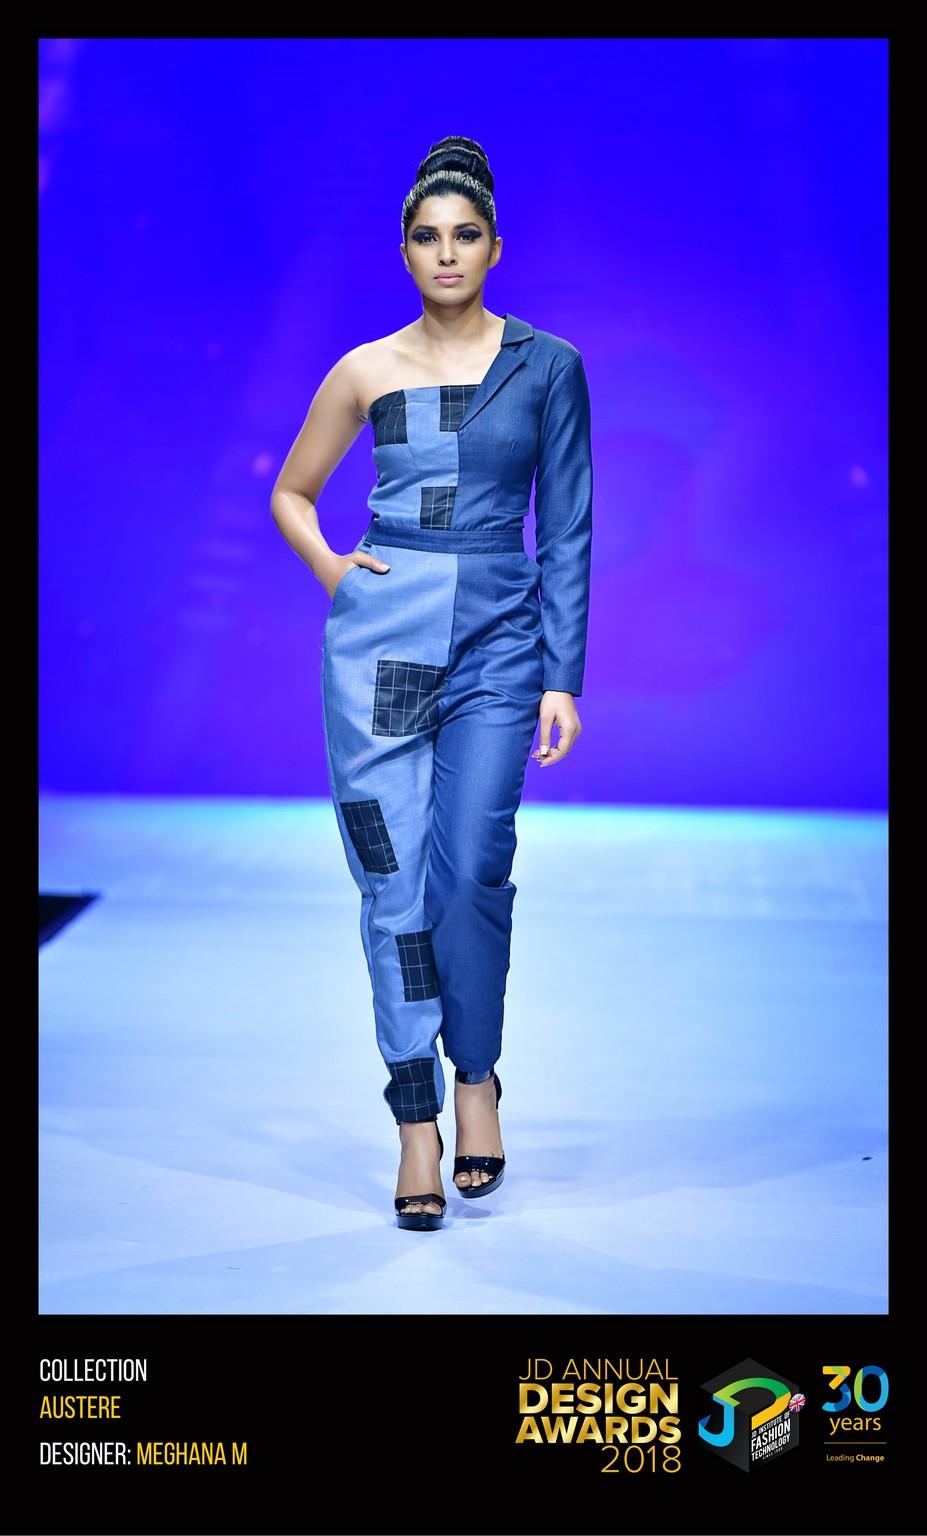 Austere – Change – JD Annual Design Awards 2018   Designer: Meghana   Photography : Jerin Nath (@jerin_nath) austere - AUSTERE1 - Austere – Change – JD Annual Design Awards 2018